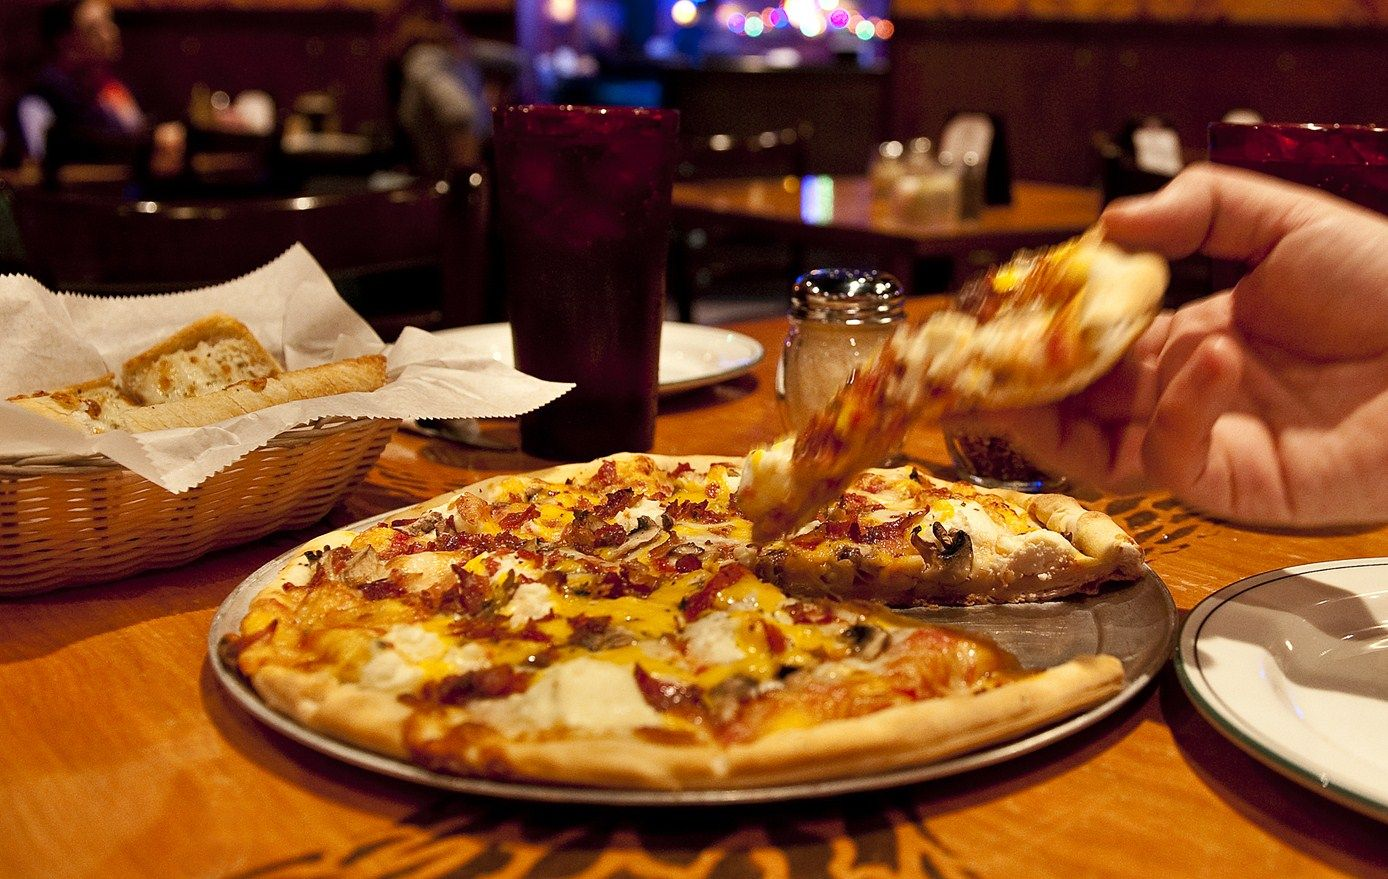 Bazbeaux Pizza Indy S Best Since 1986 Broad Ripple Location 811 E Westfield Blvd